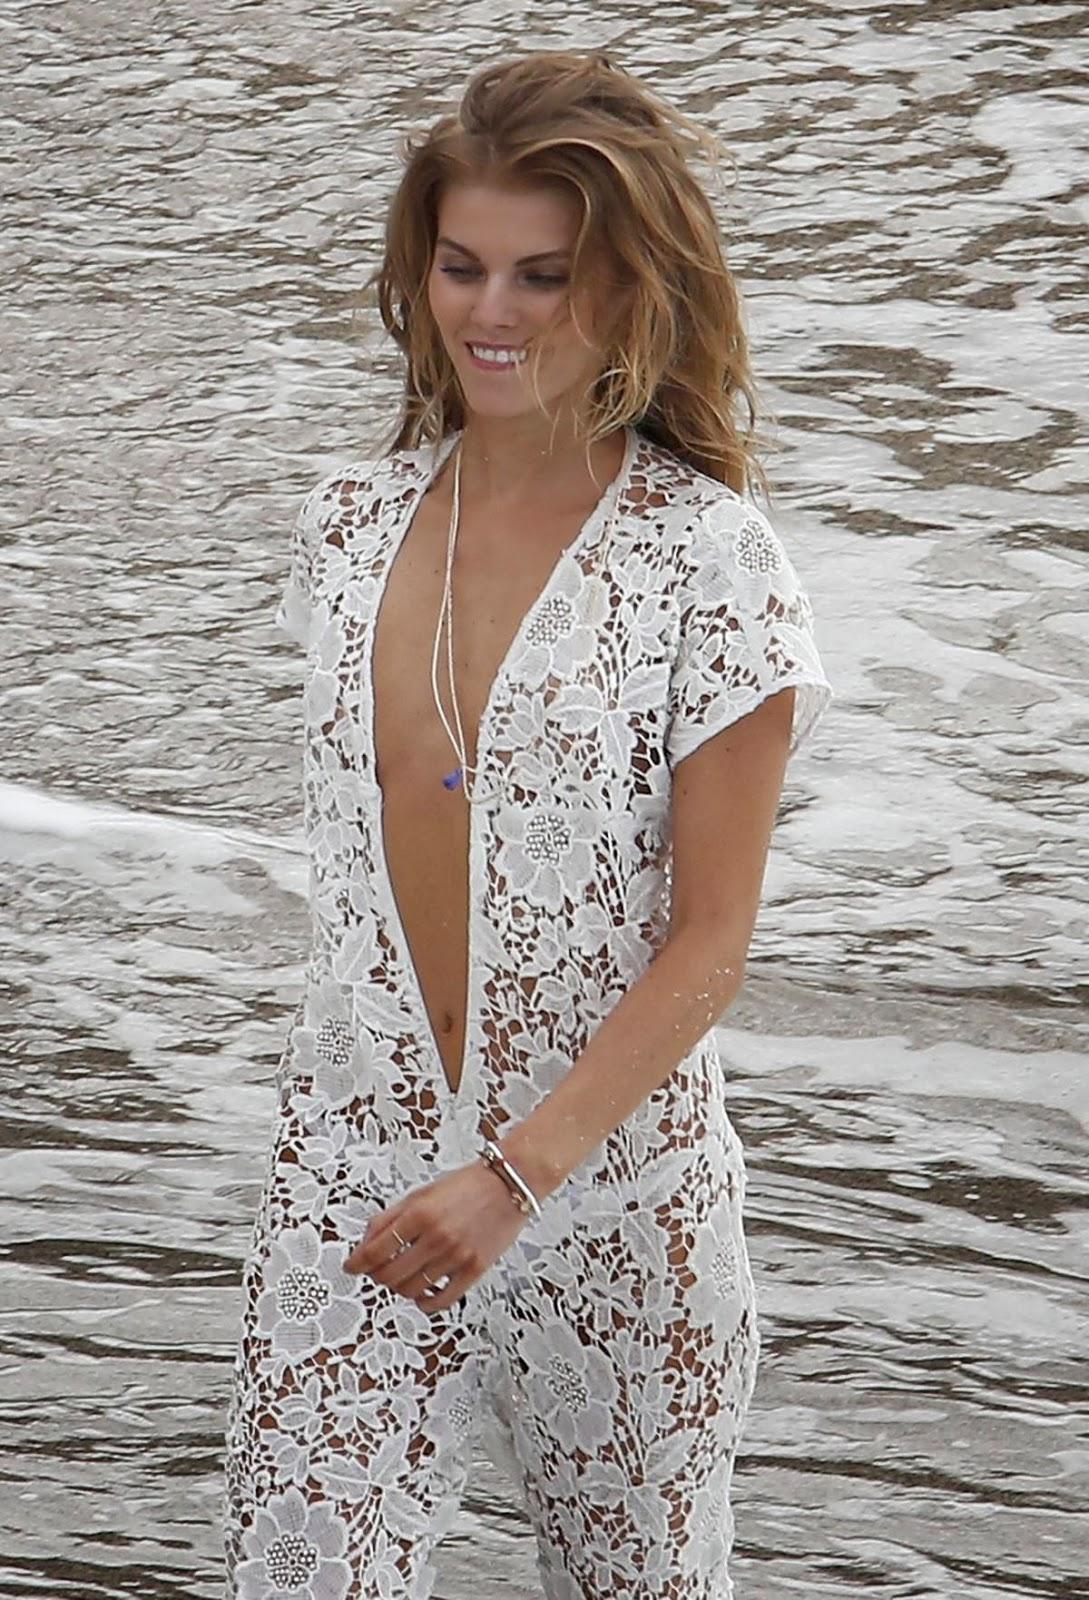 Maryna Linchuk Topless Handbra Lingerie Photoshoot Candids On A Beach In St. Barths   Hot Girls